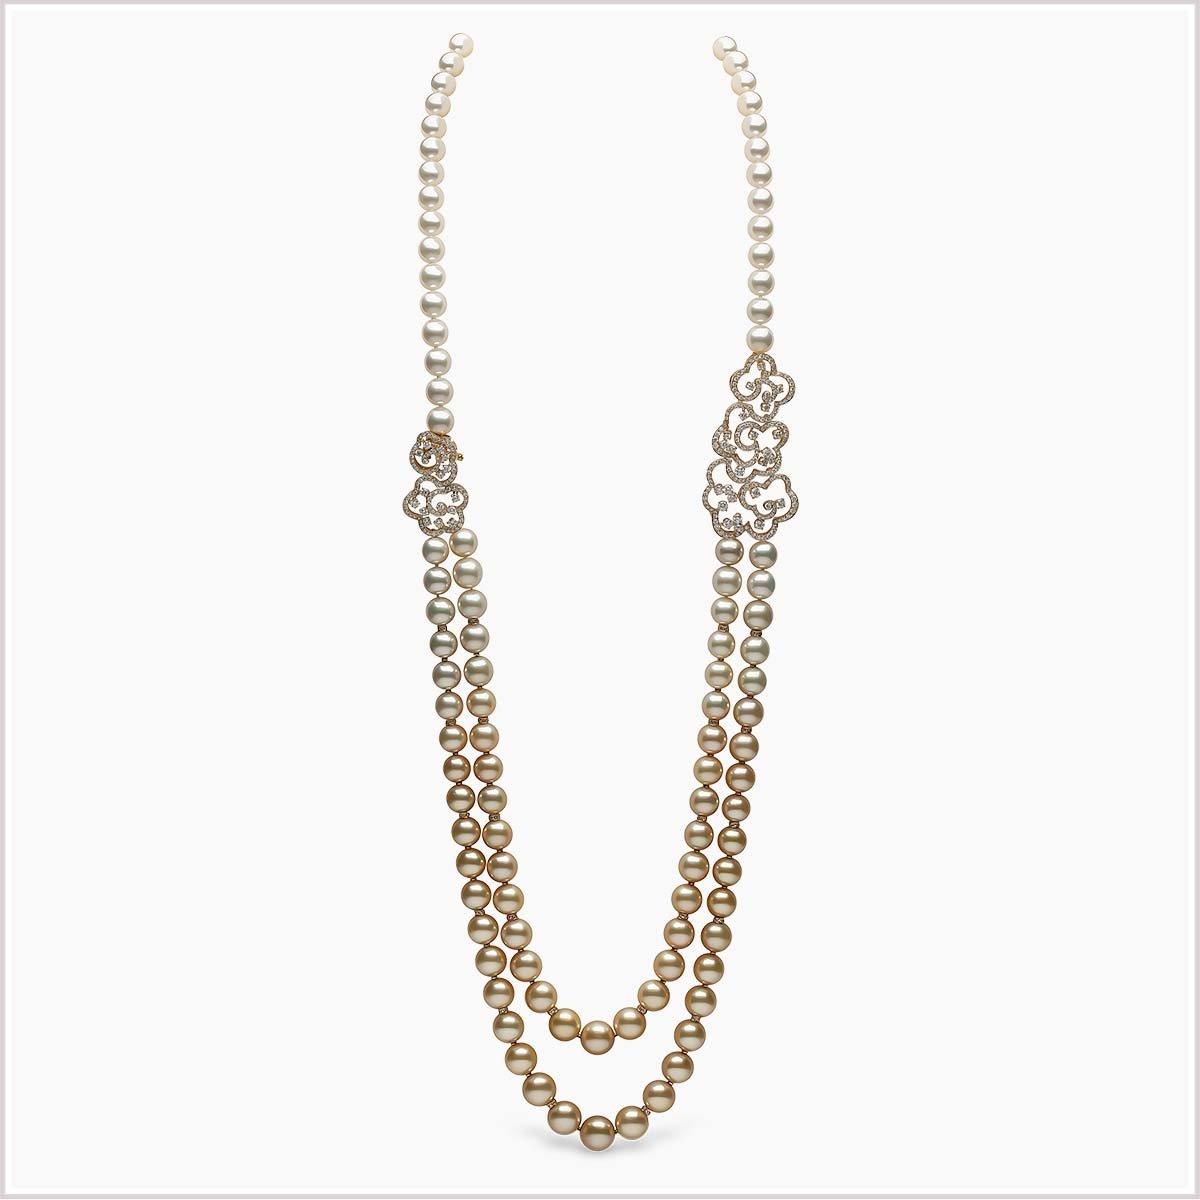 Yoko London Aurelia Diamonds, South Sea Pearl and Golden South Sea Pearl Necklace